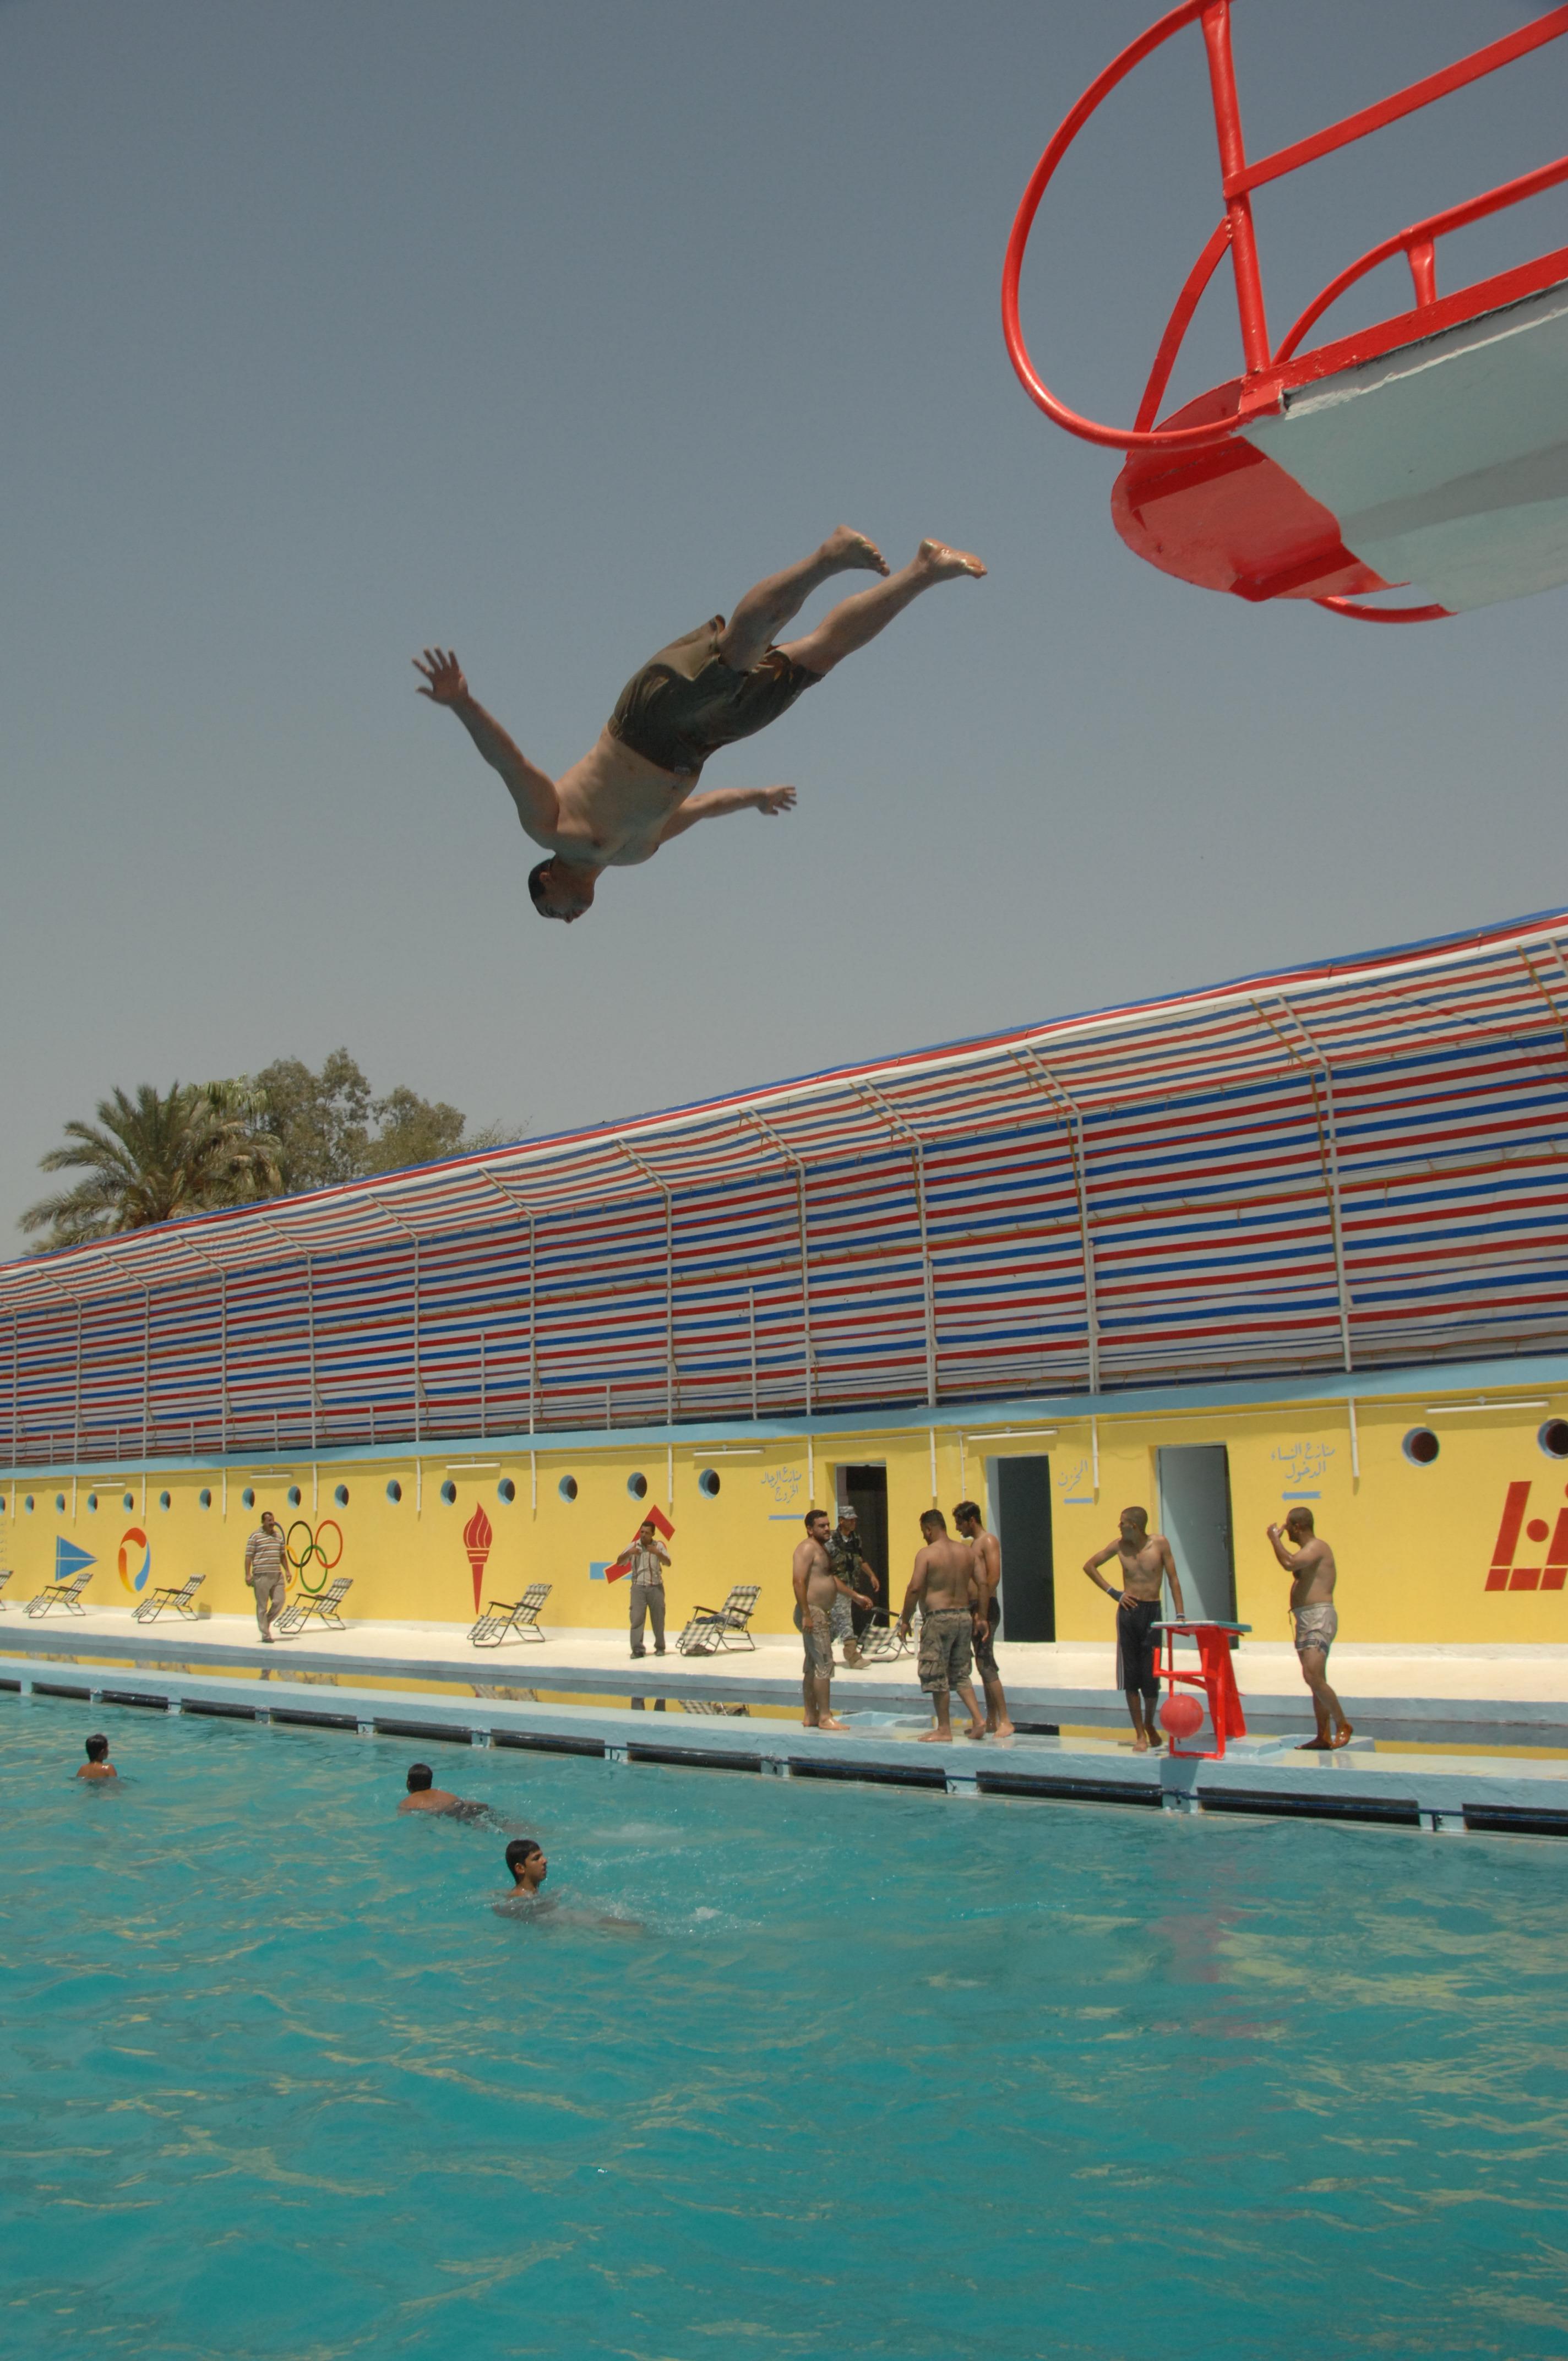 File:A man dives off the high dive platform at the al ...